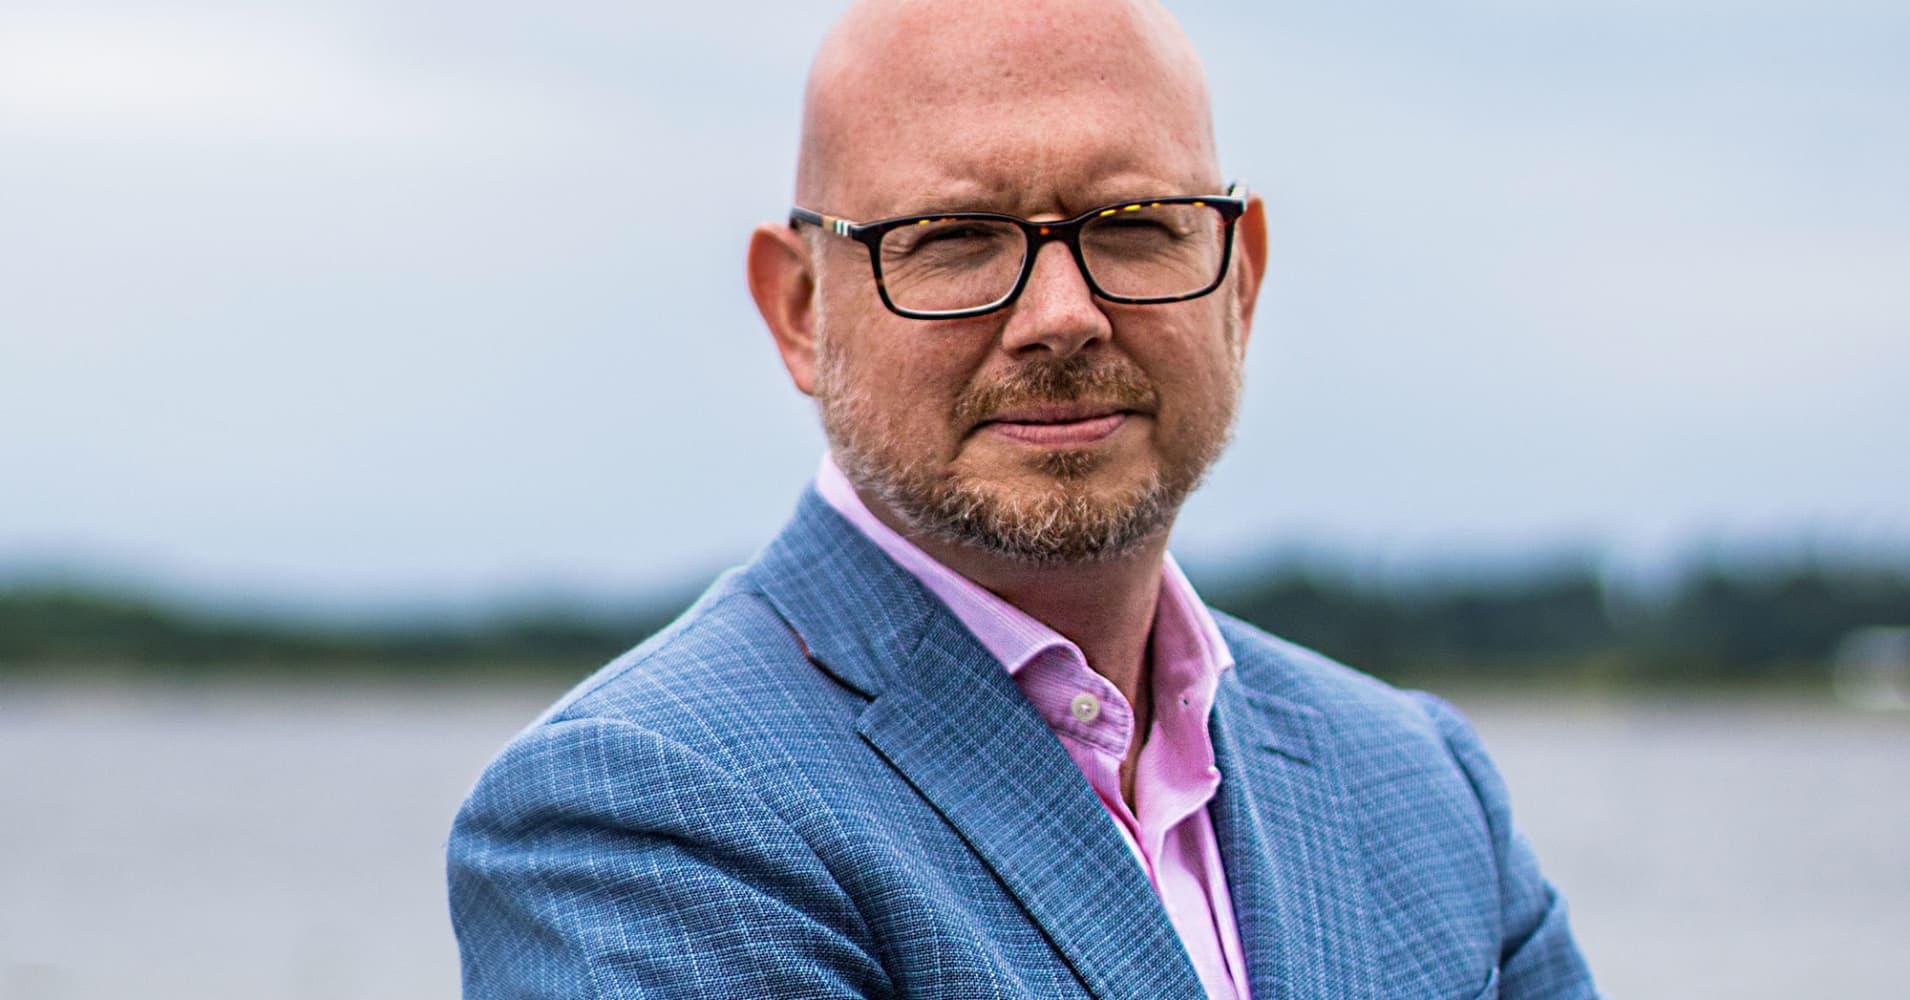 Keld Jensen, negotiation expert and author.